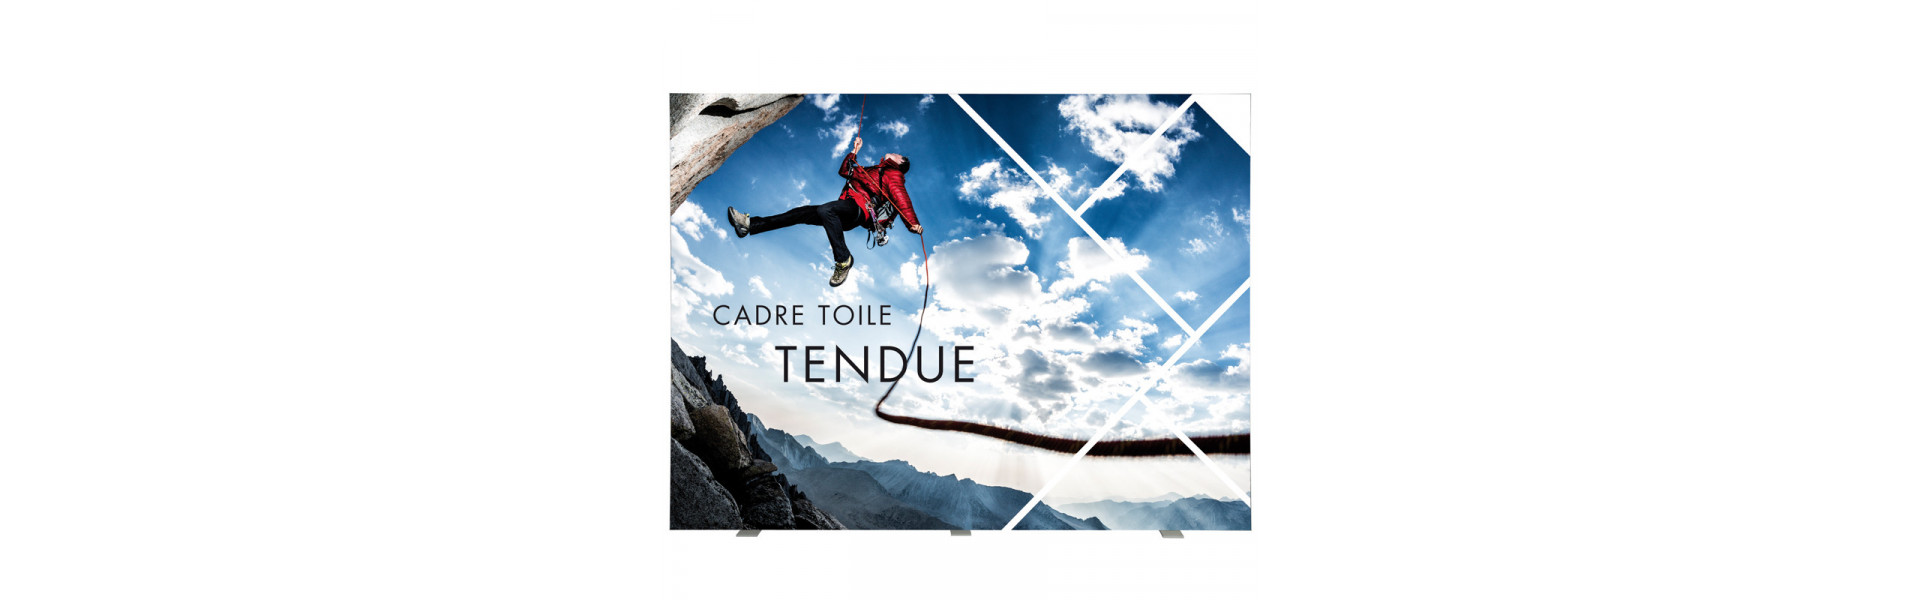 Cadre - Toile Tendue